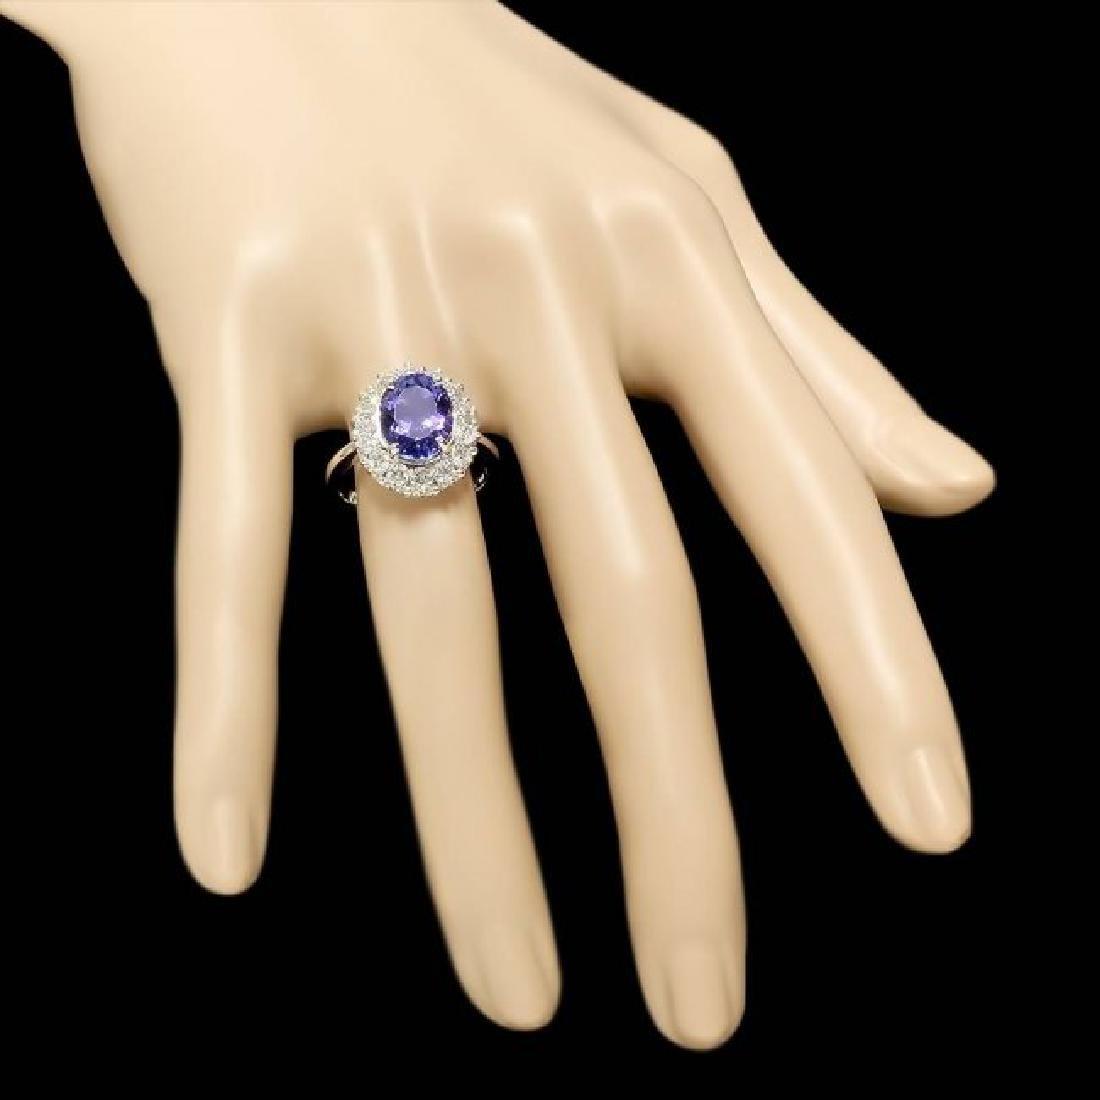 14k Gold 4.00ct Tanzanite 1.00ct Diamond Ring - 4